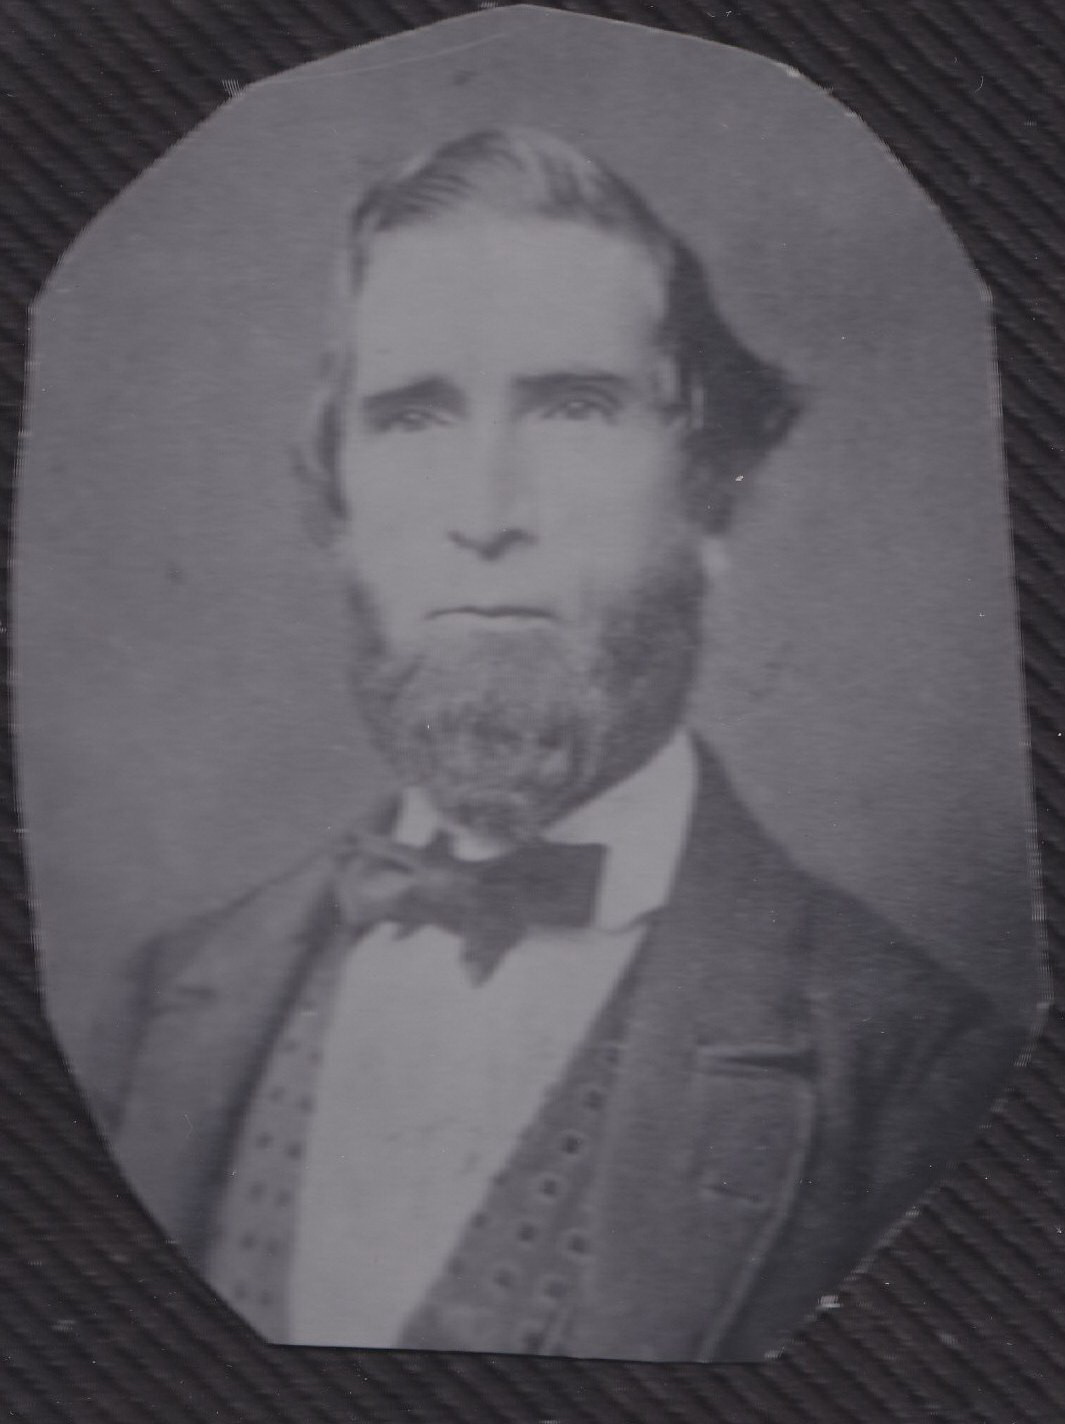 Joshua Robert Calloway Brown